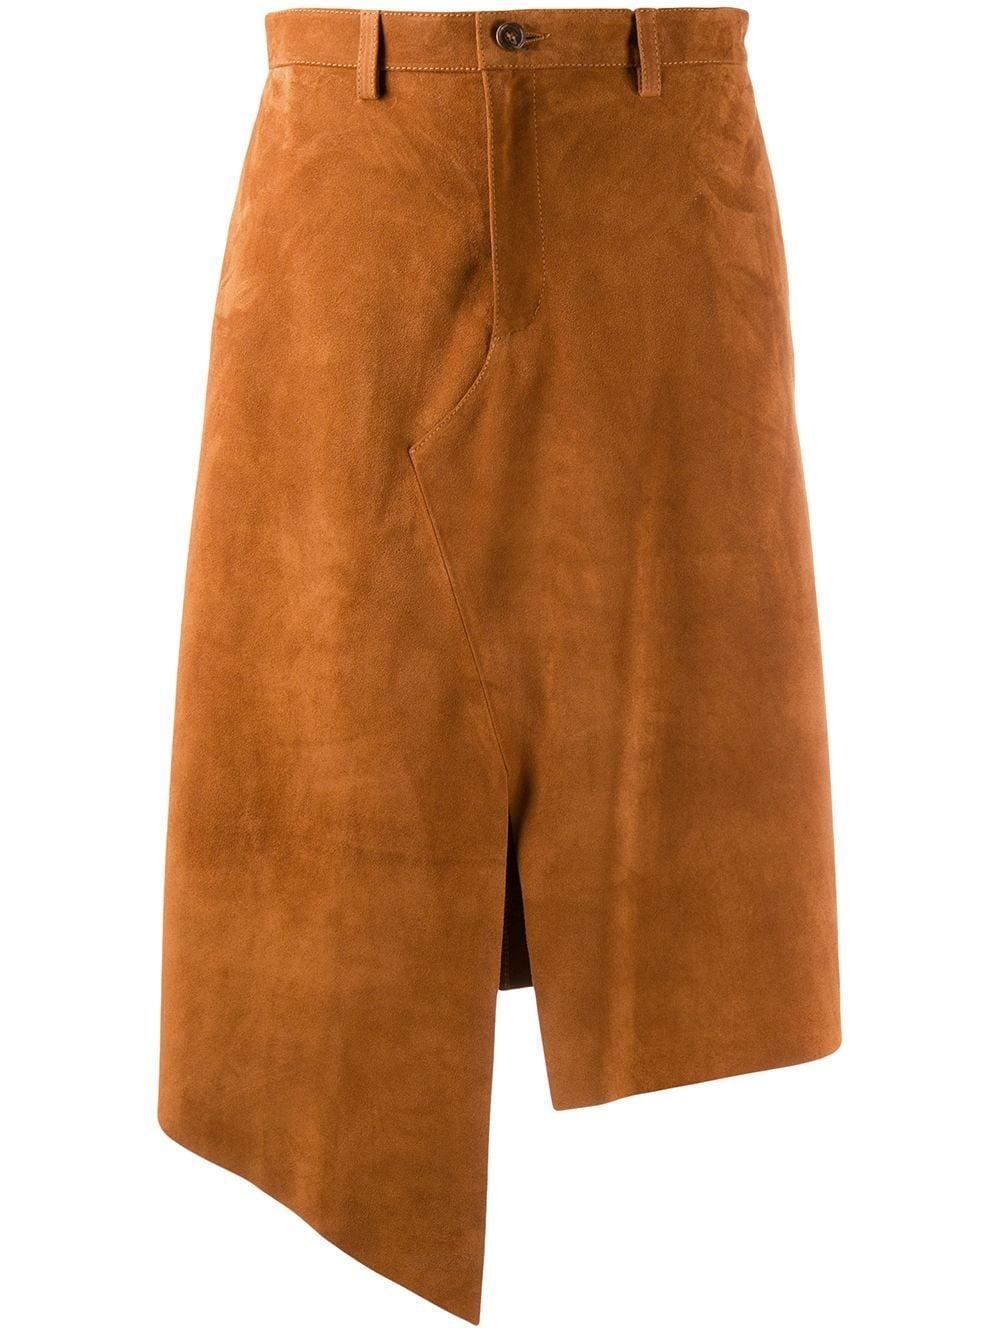 Maison Margiela юбка асимметричного кроя с разрезом